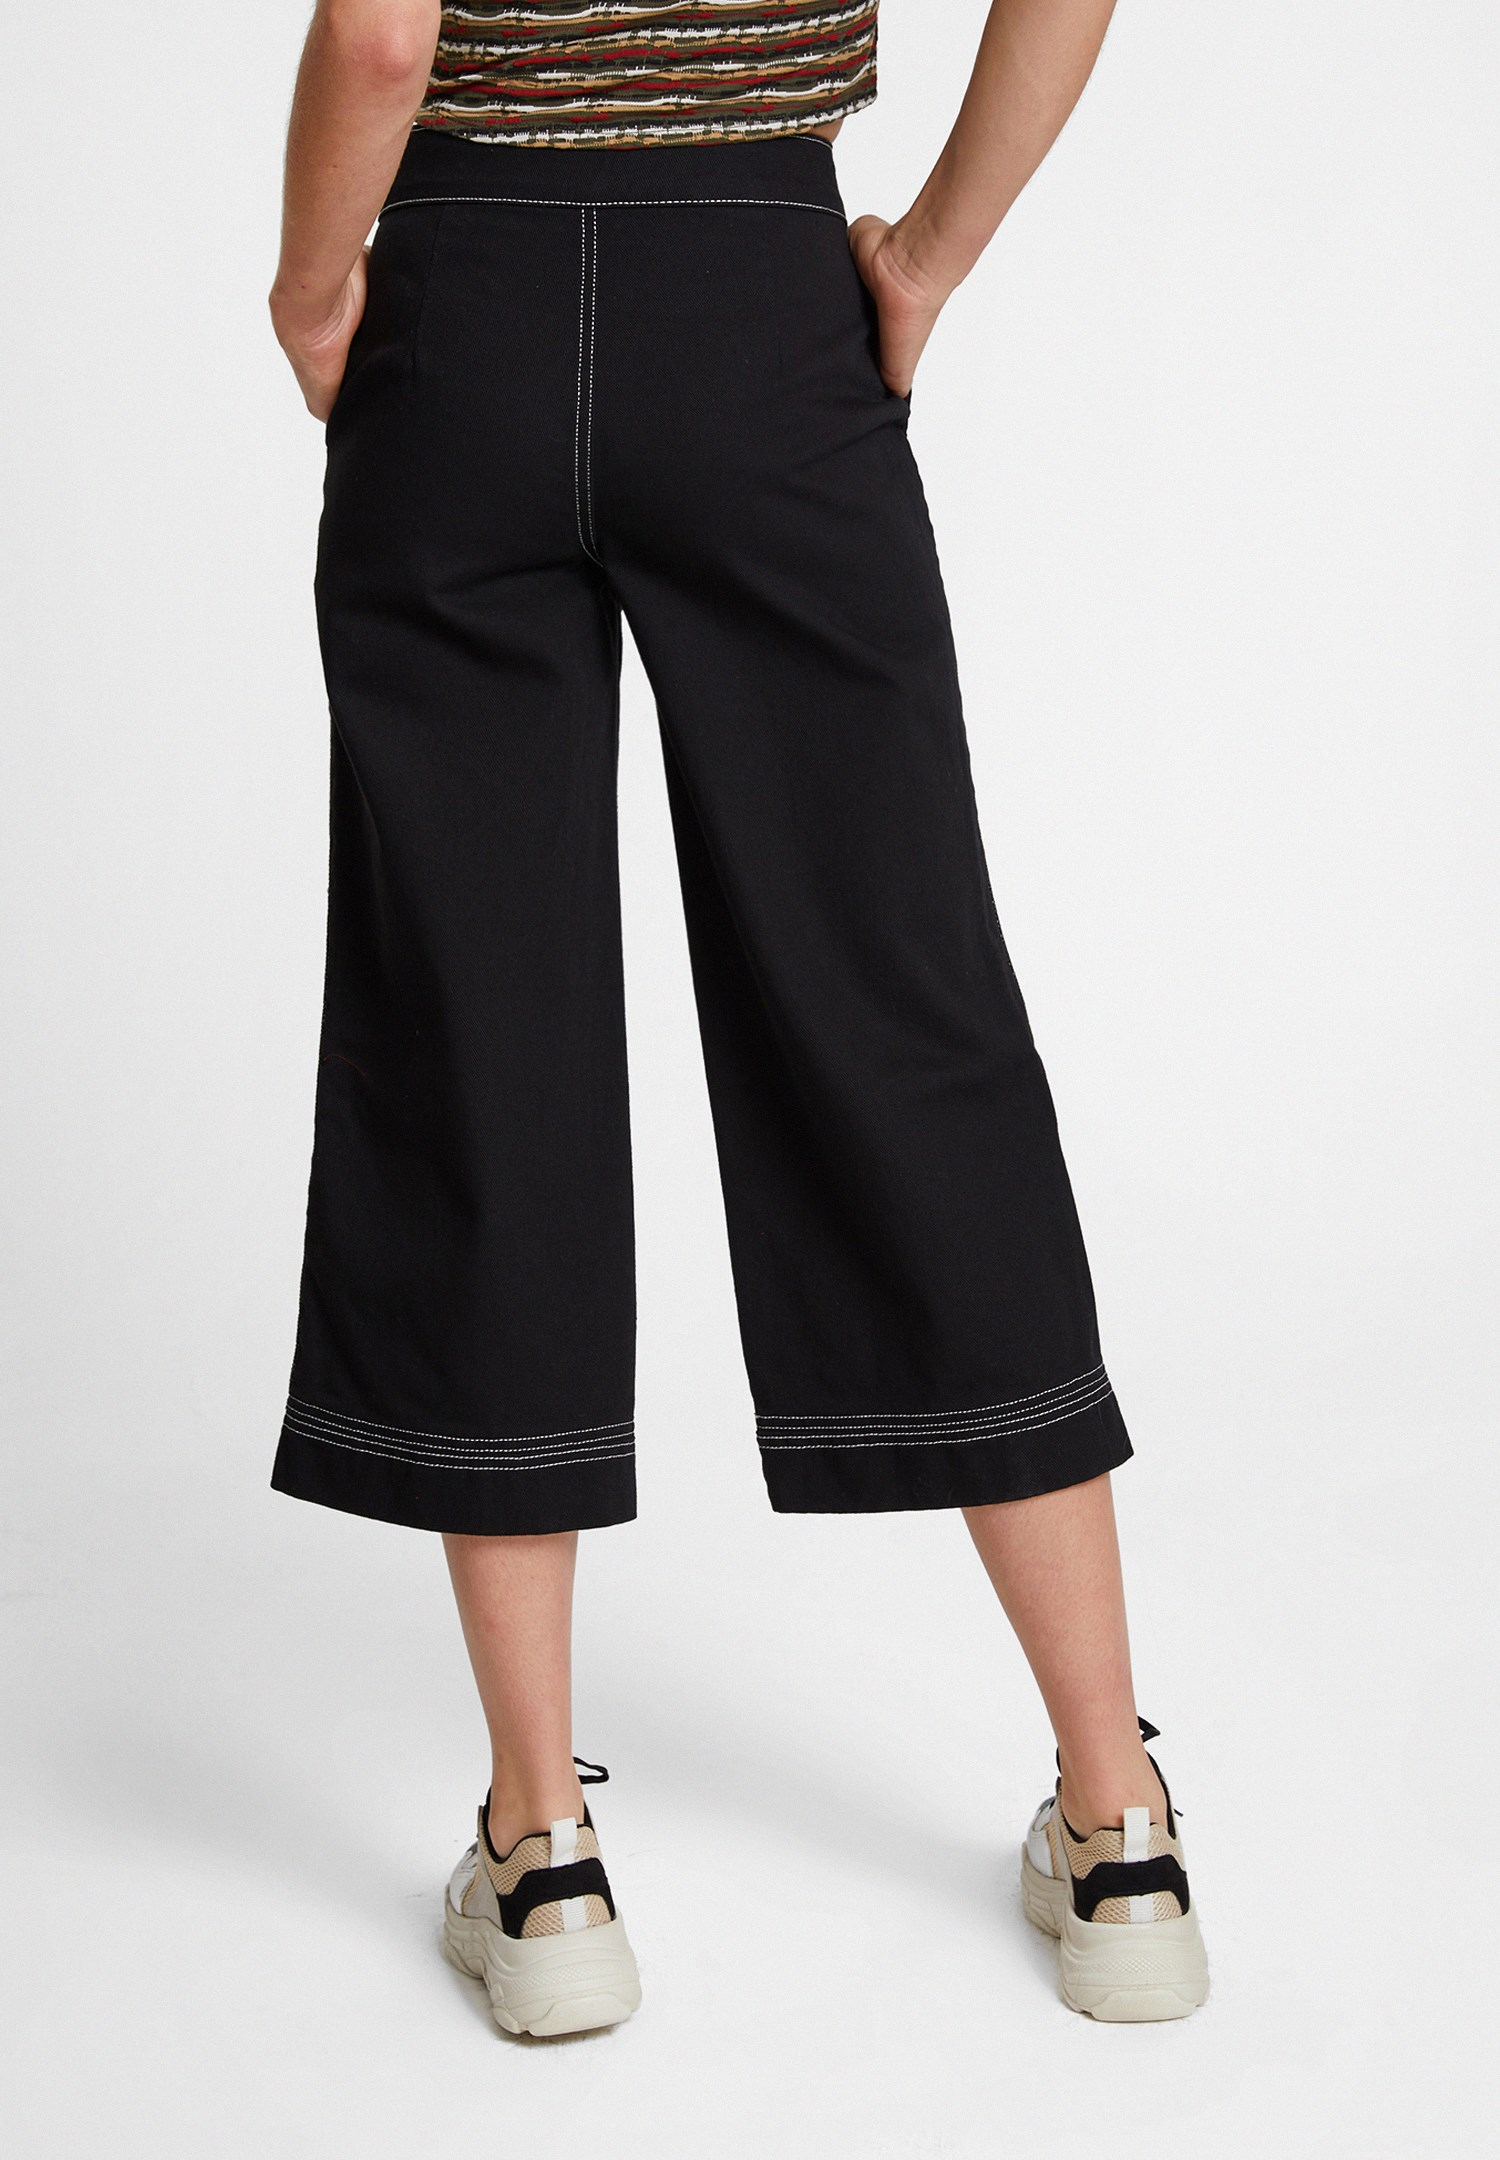 Bayan Siyah Yüksek Bel Cep Detaylı Bol Pantolon